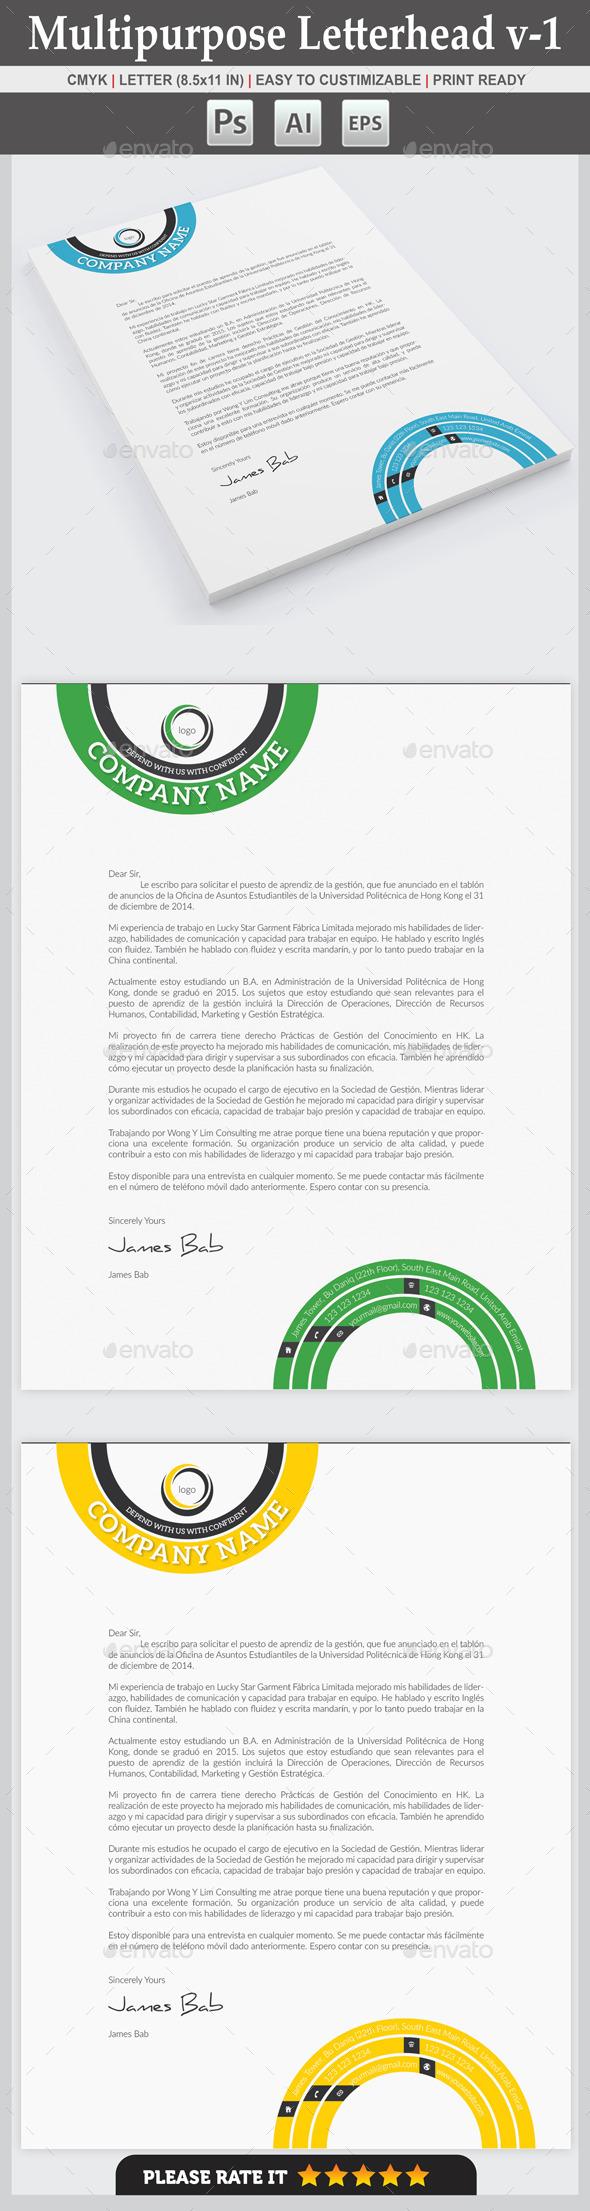 Multipurpose Letterhead v-1 - Stationery Print Templates